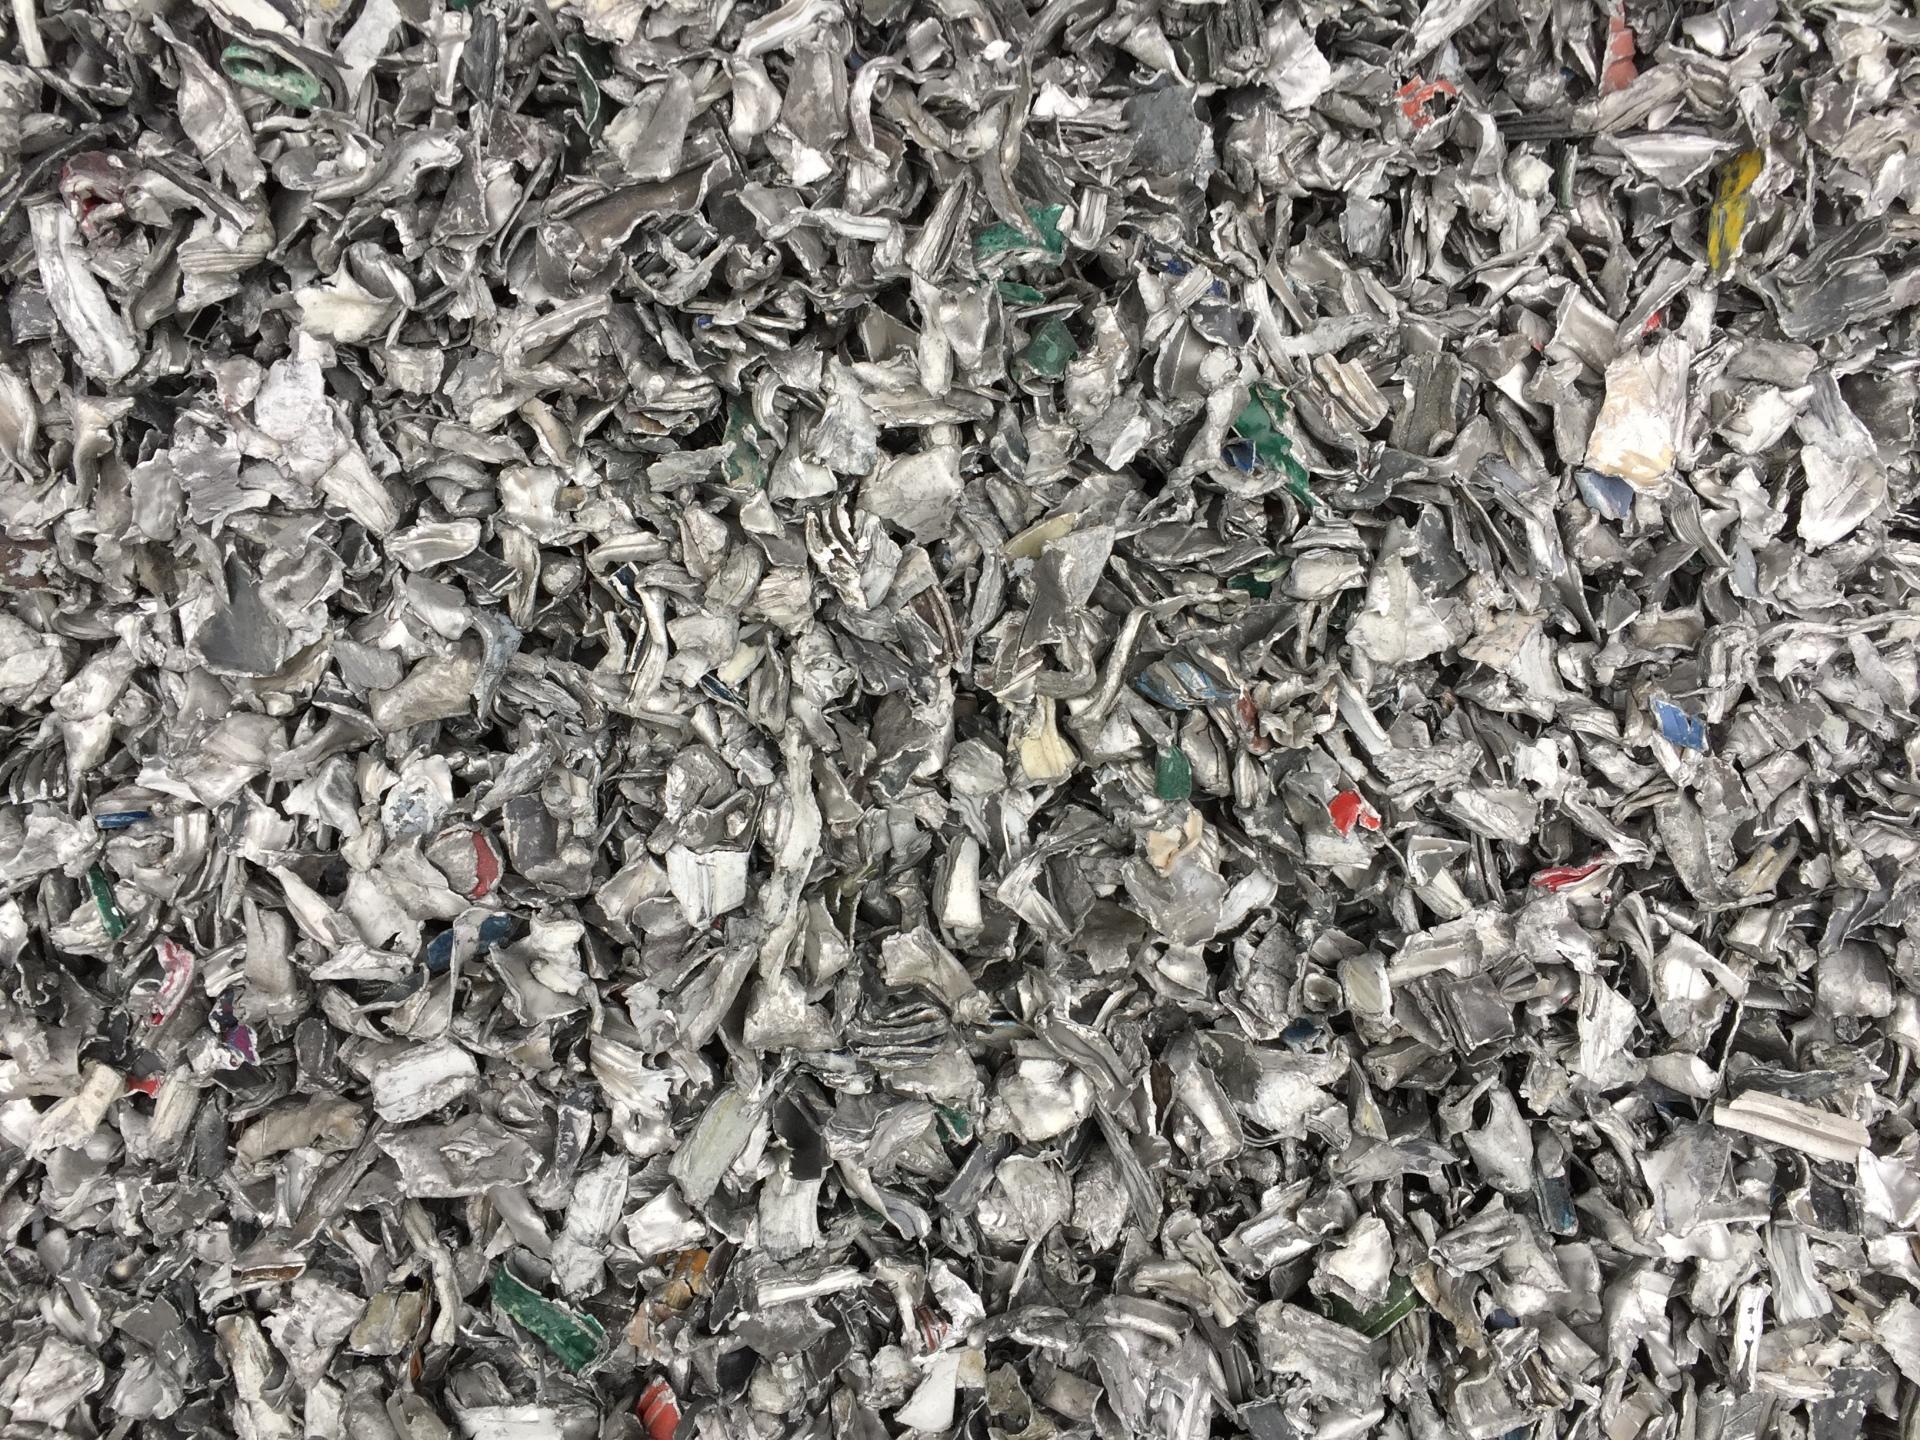 Aluminum after shredder